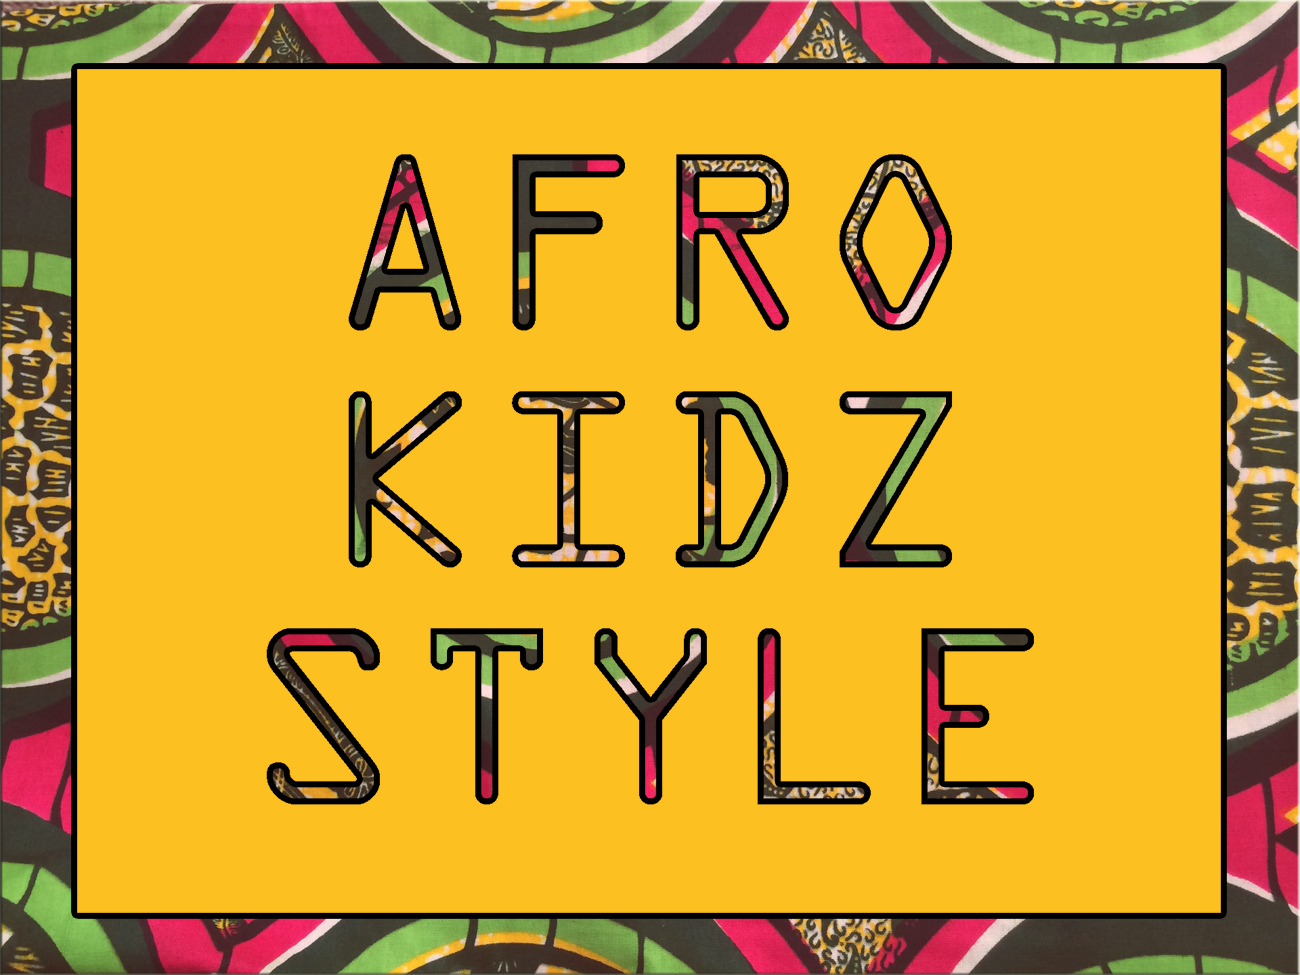 bannière-afrokidzstyle-grande-taille